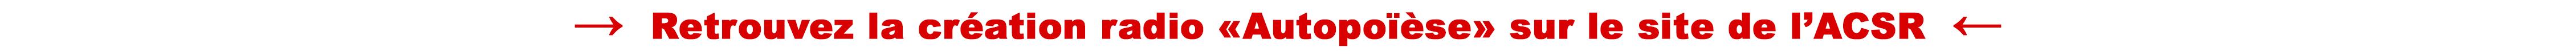 http://labomedia.a.l.f.unblog.fr/files/2019/04/barre-menu-autopoiese-02.png